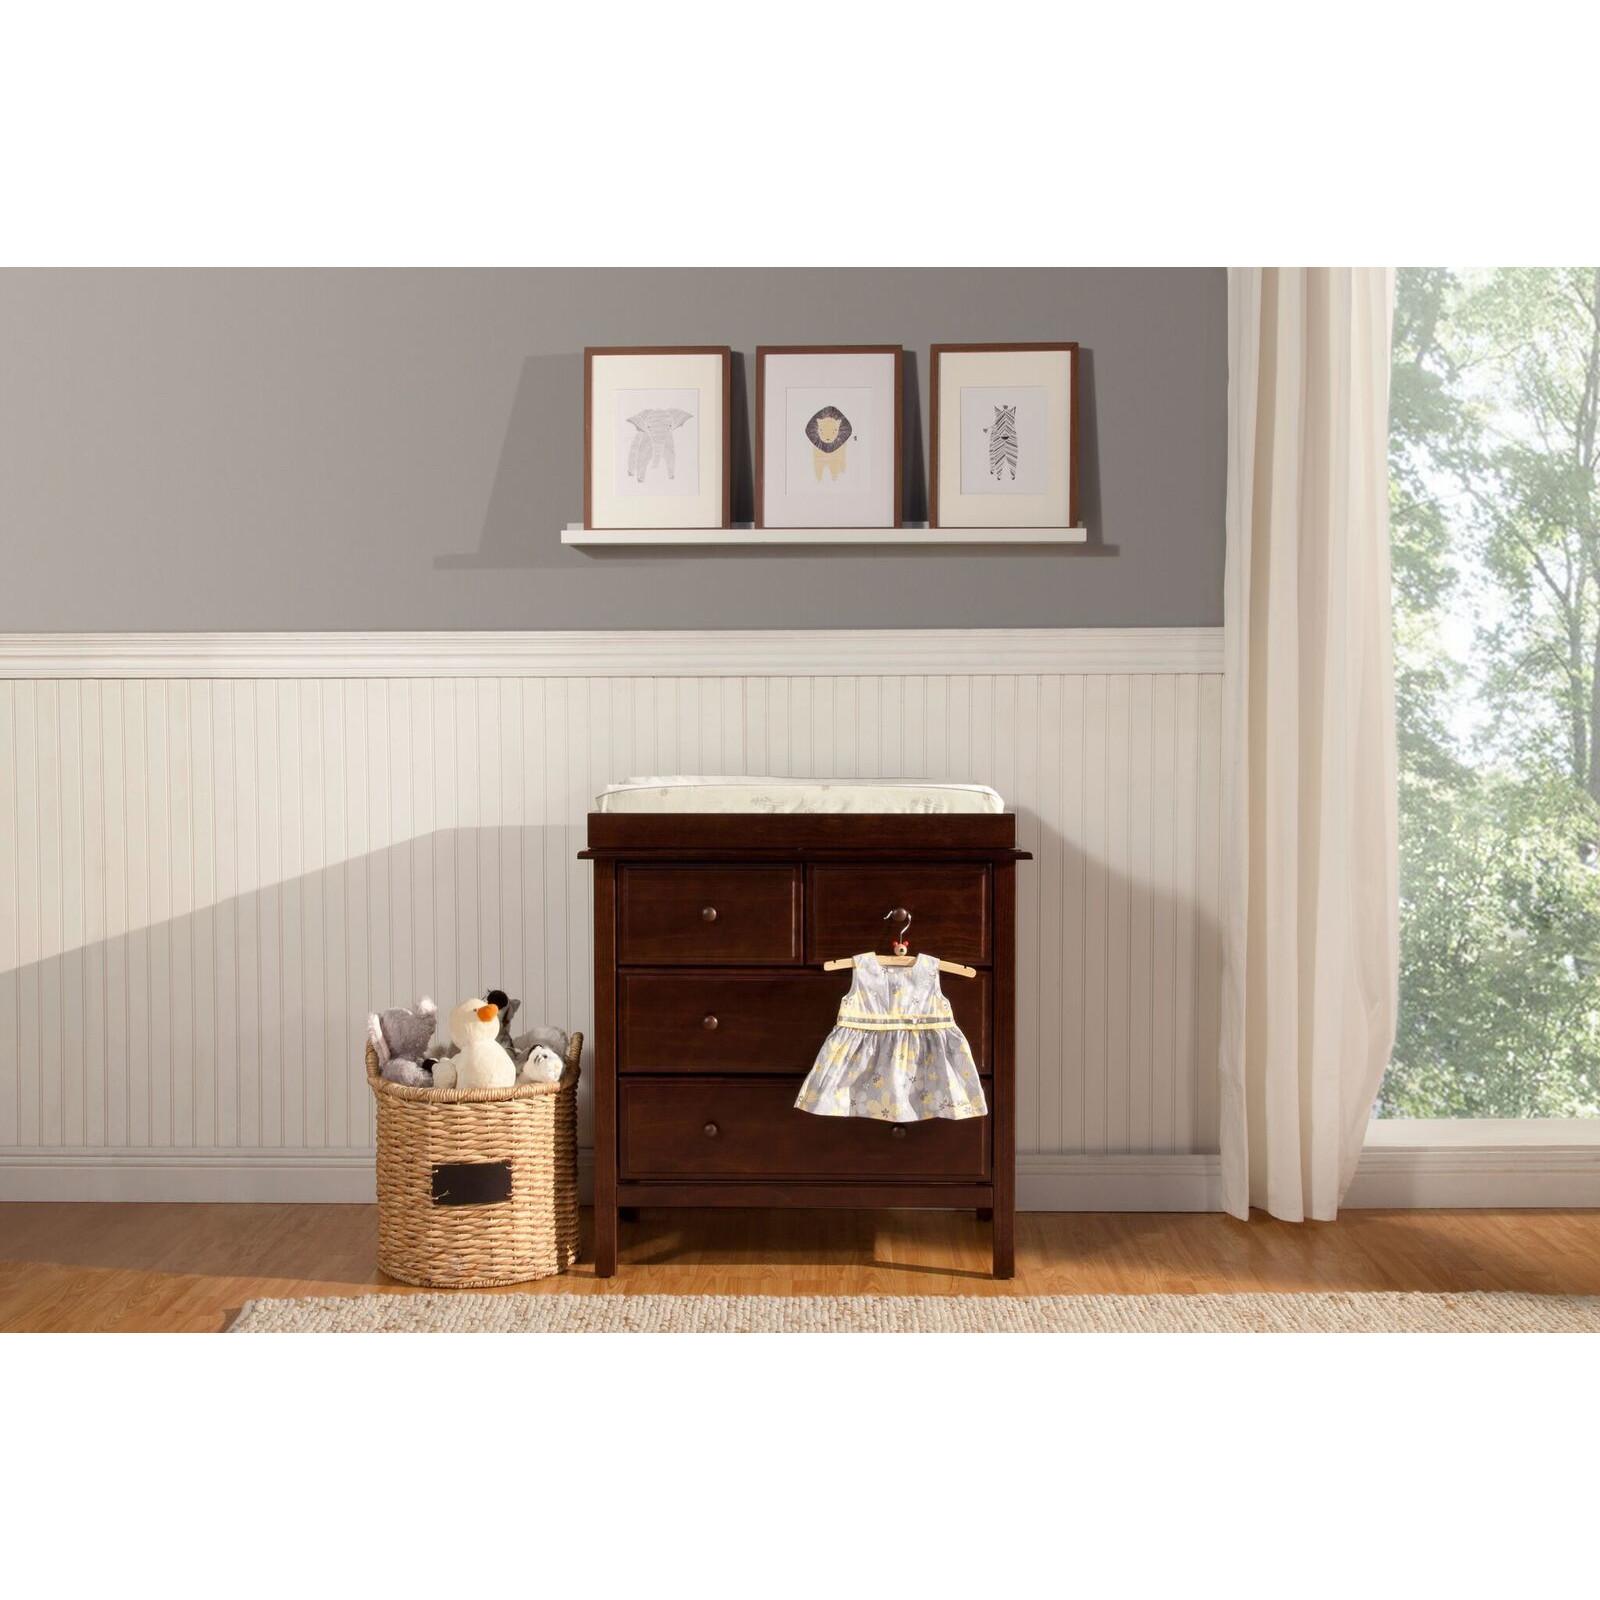 Davinci Kalani Combo Dresser White | Davinci Kalani Dresser | Kalani Changing Table